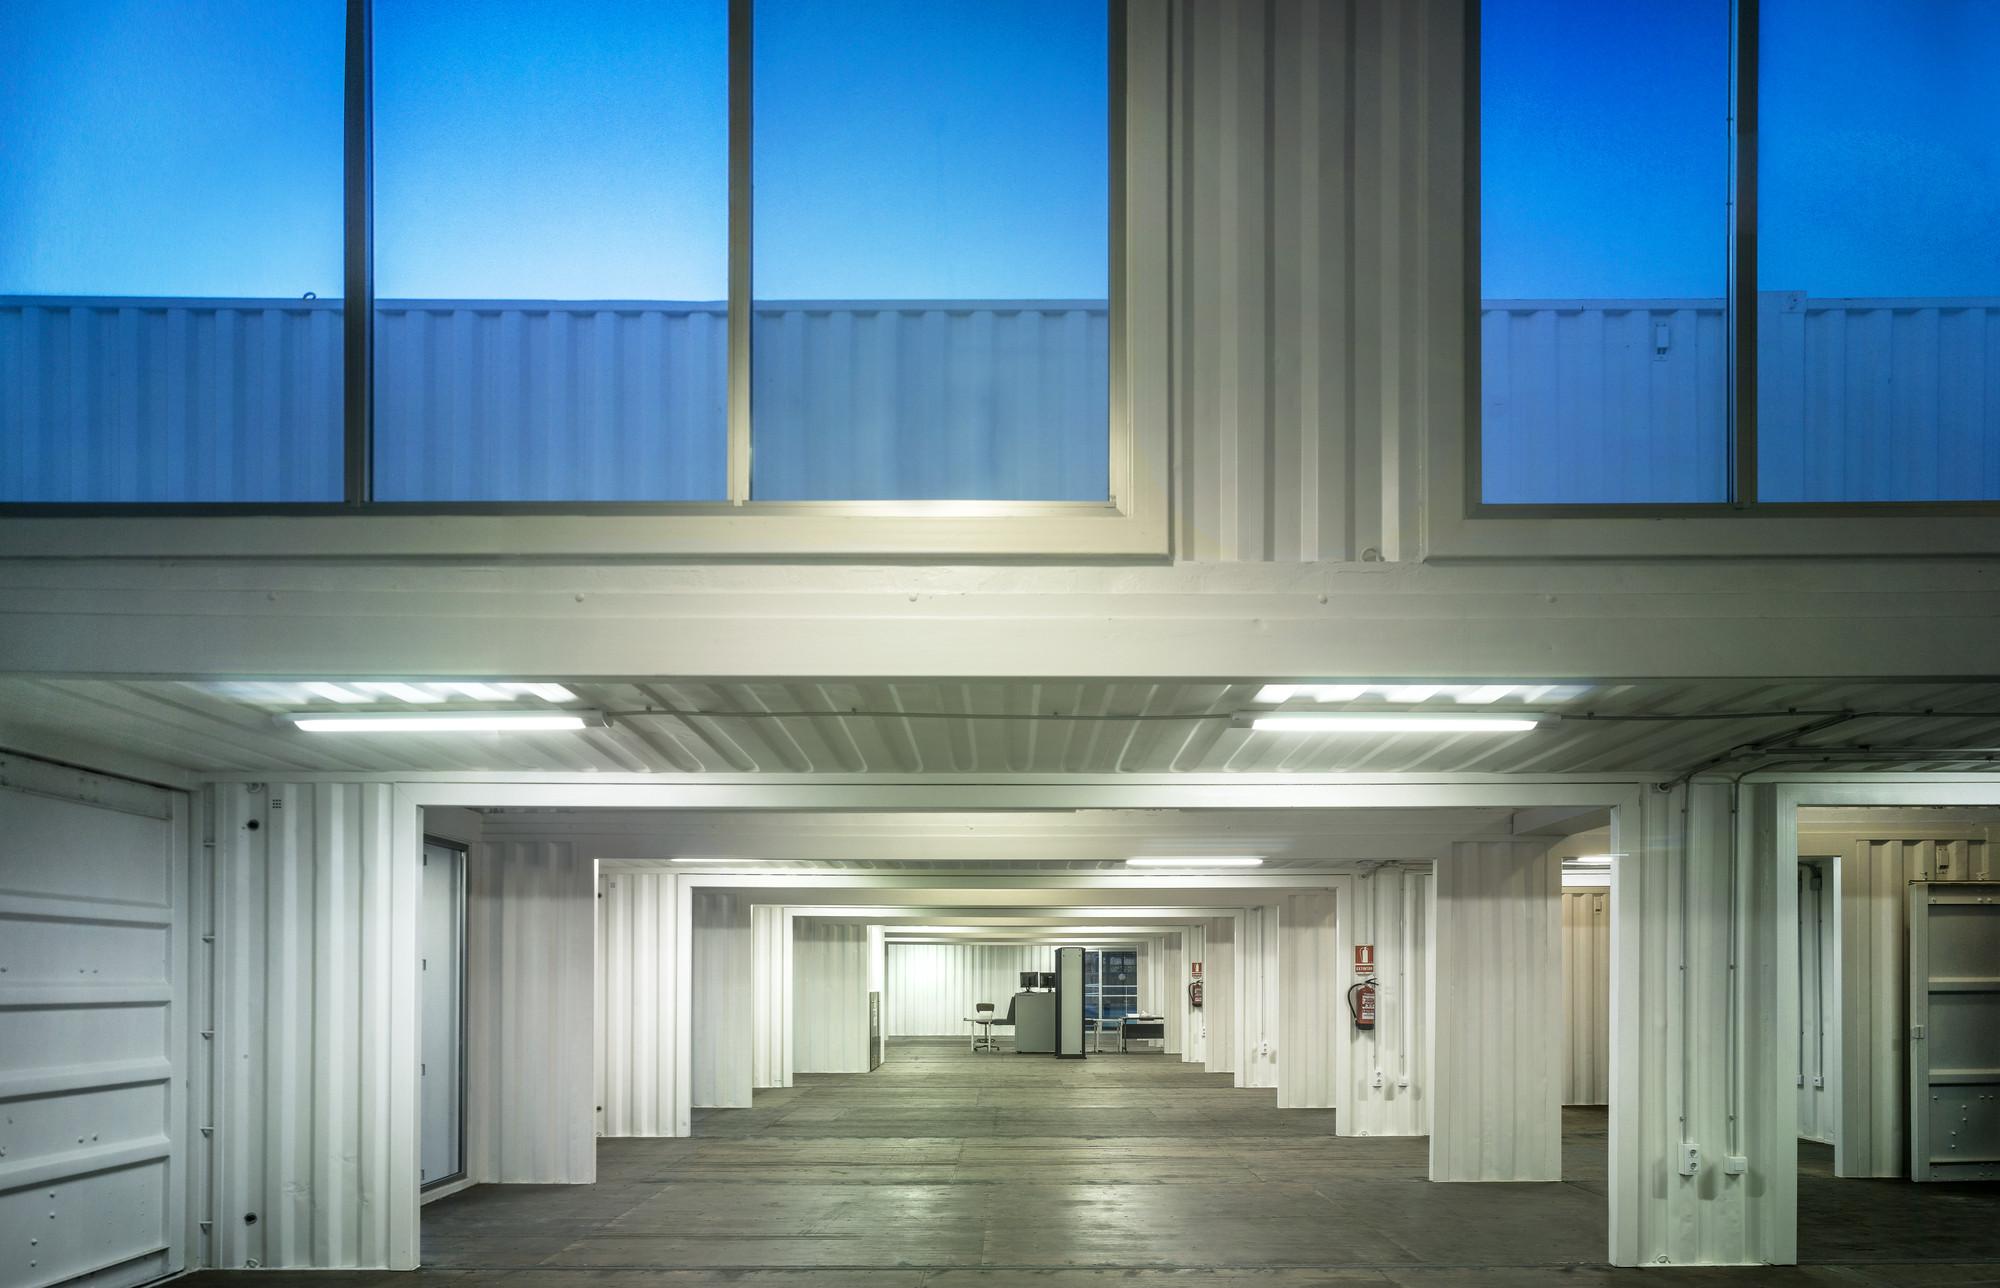 Galer a de proyecto de iluminaci n terminal de cruceros - Iluminacion sevilla ...